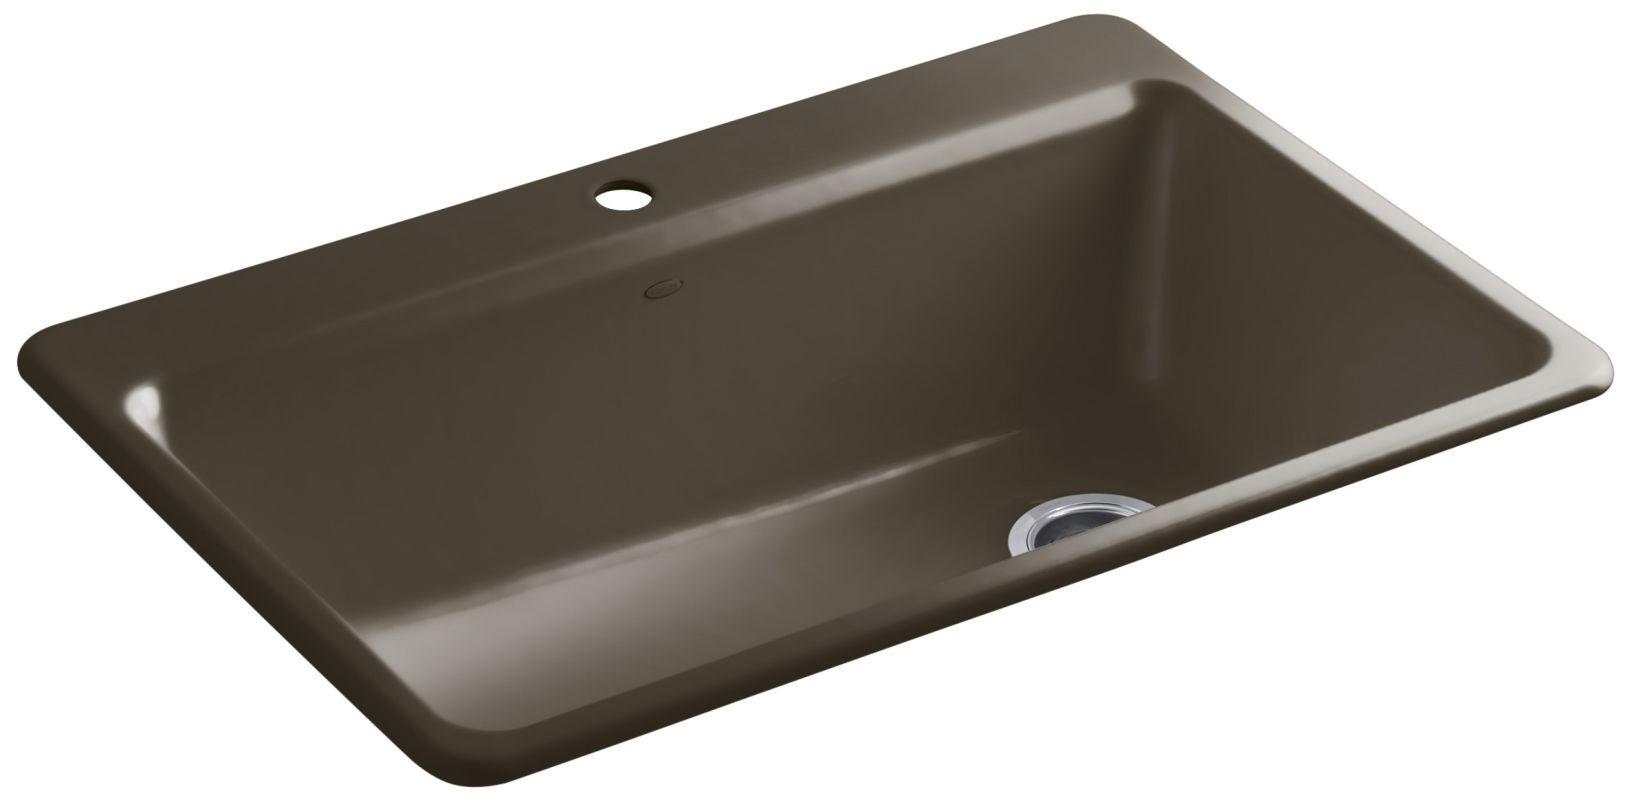 kohler k 5871 1a2 products cast iron kitchen sinks single bowl rh pinterest com